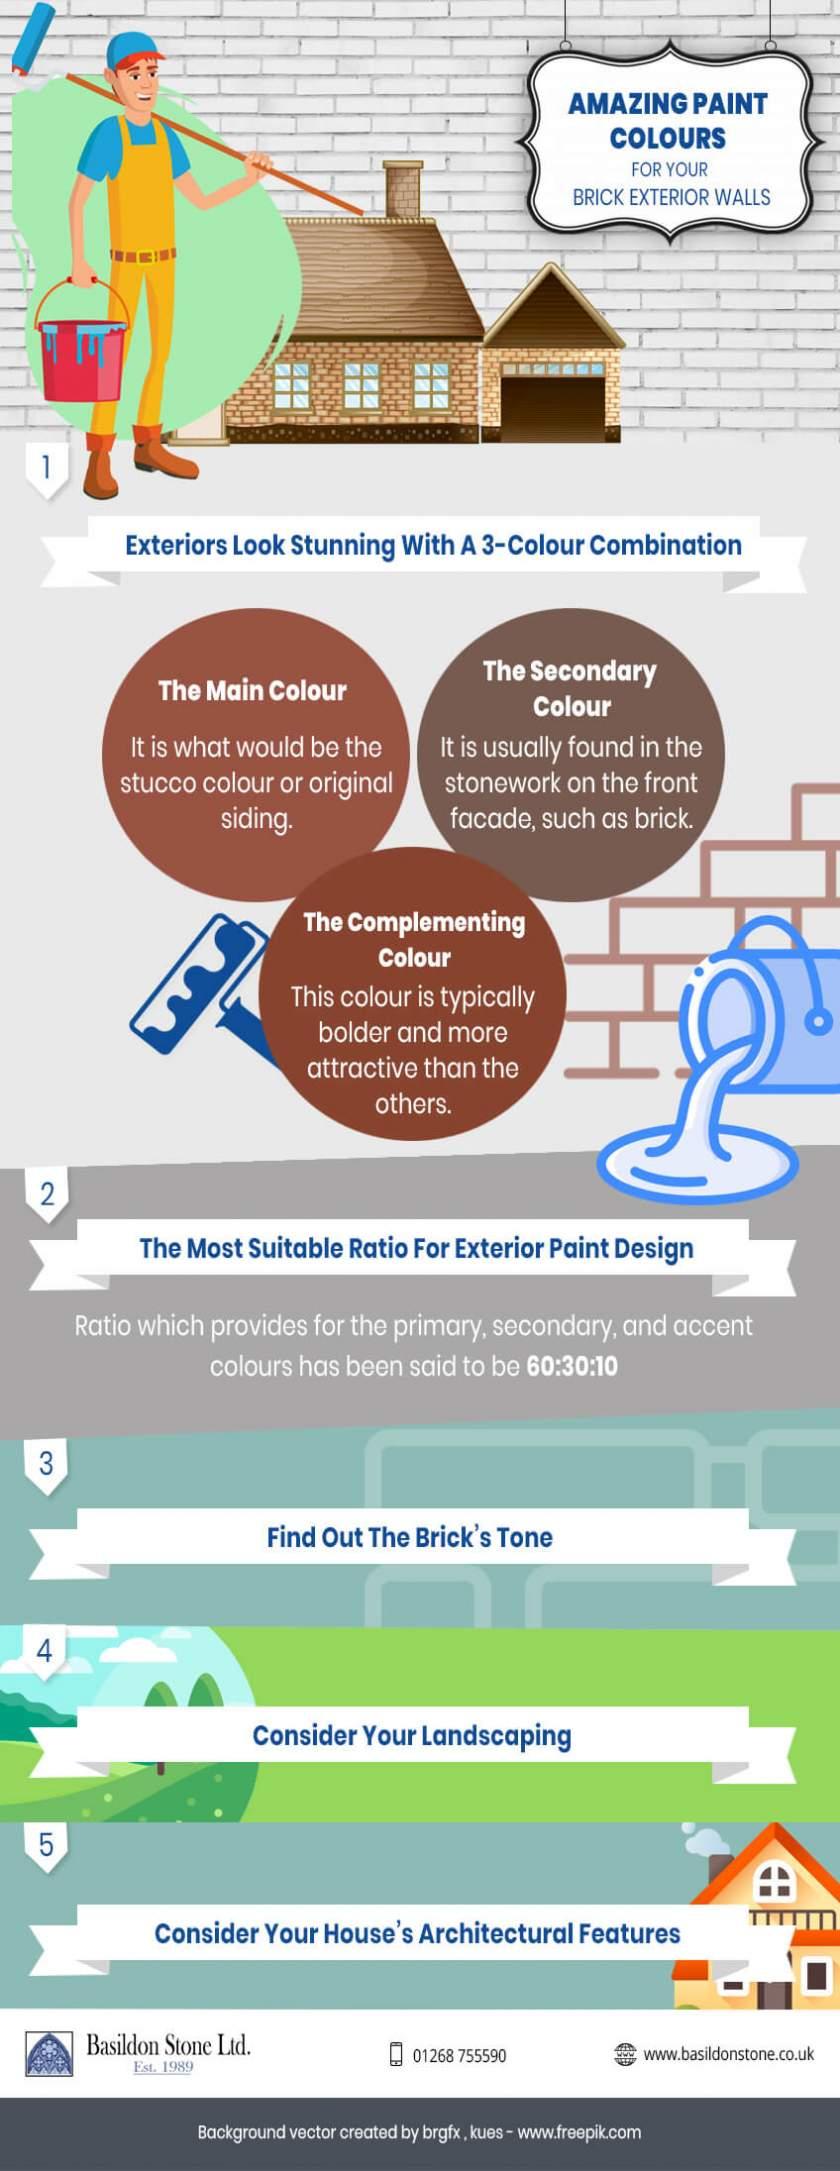 Amazing-Paint-Colours-for-Your-Brick-Exterior-Walls